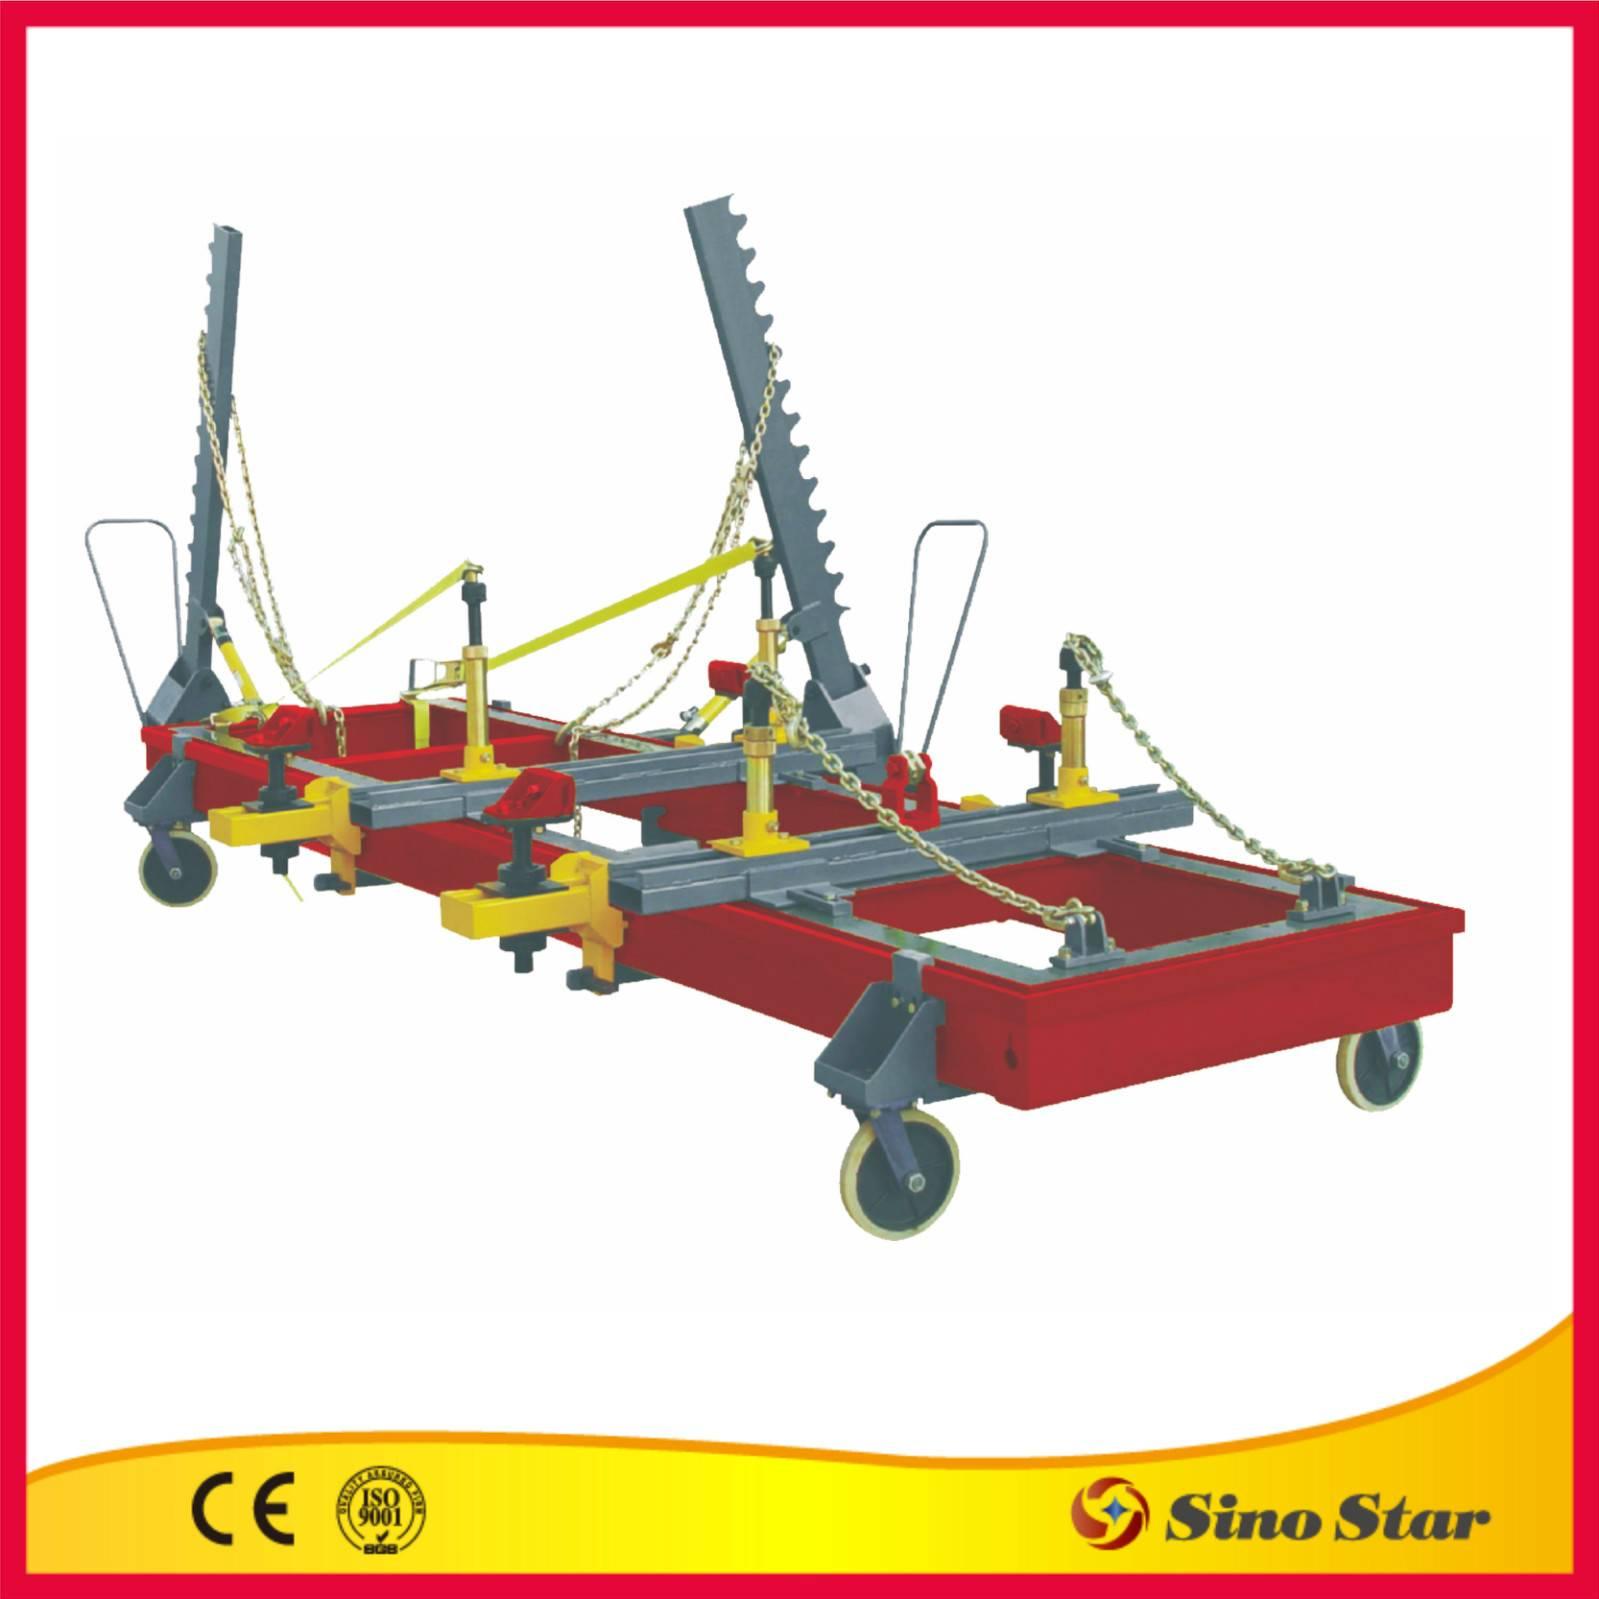 Auto Collision Repair Equipment(SS-CRT005)